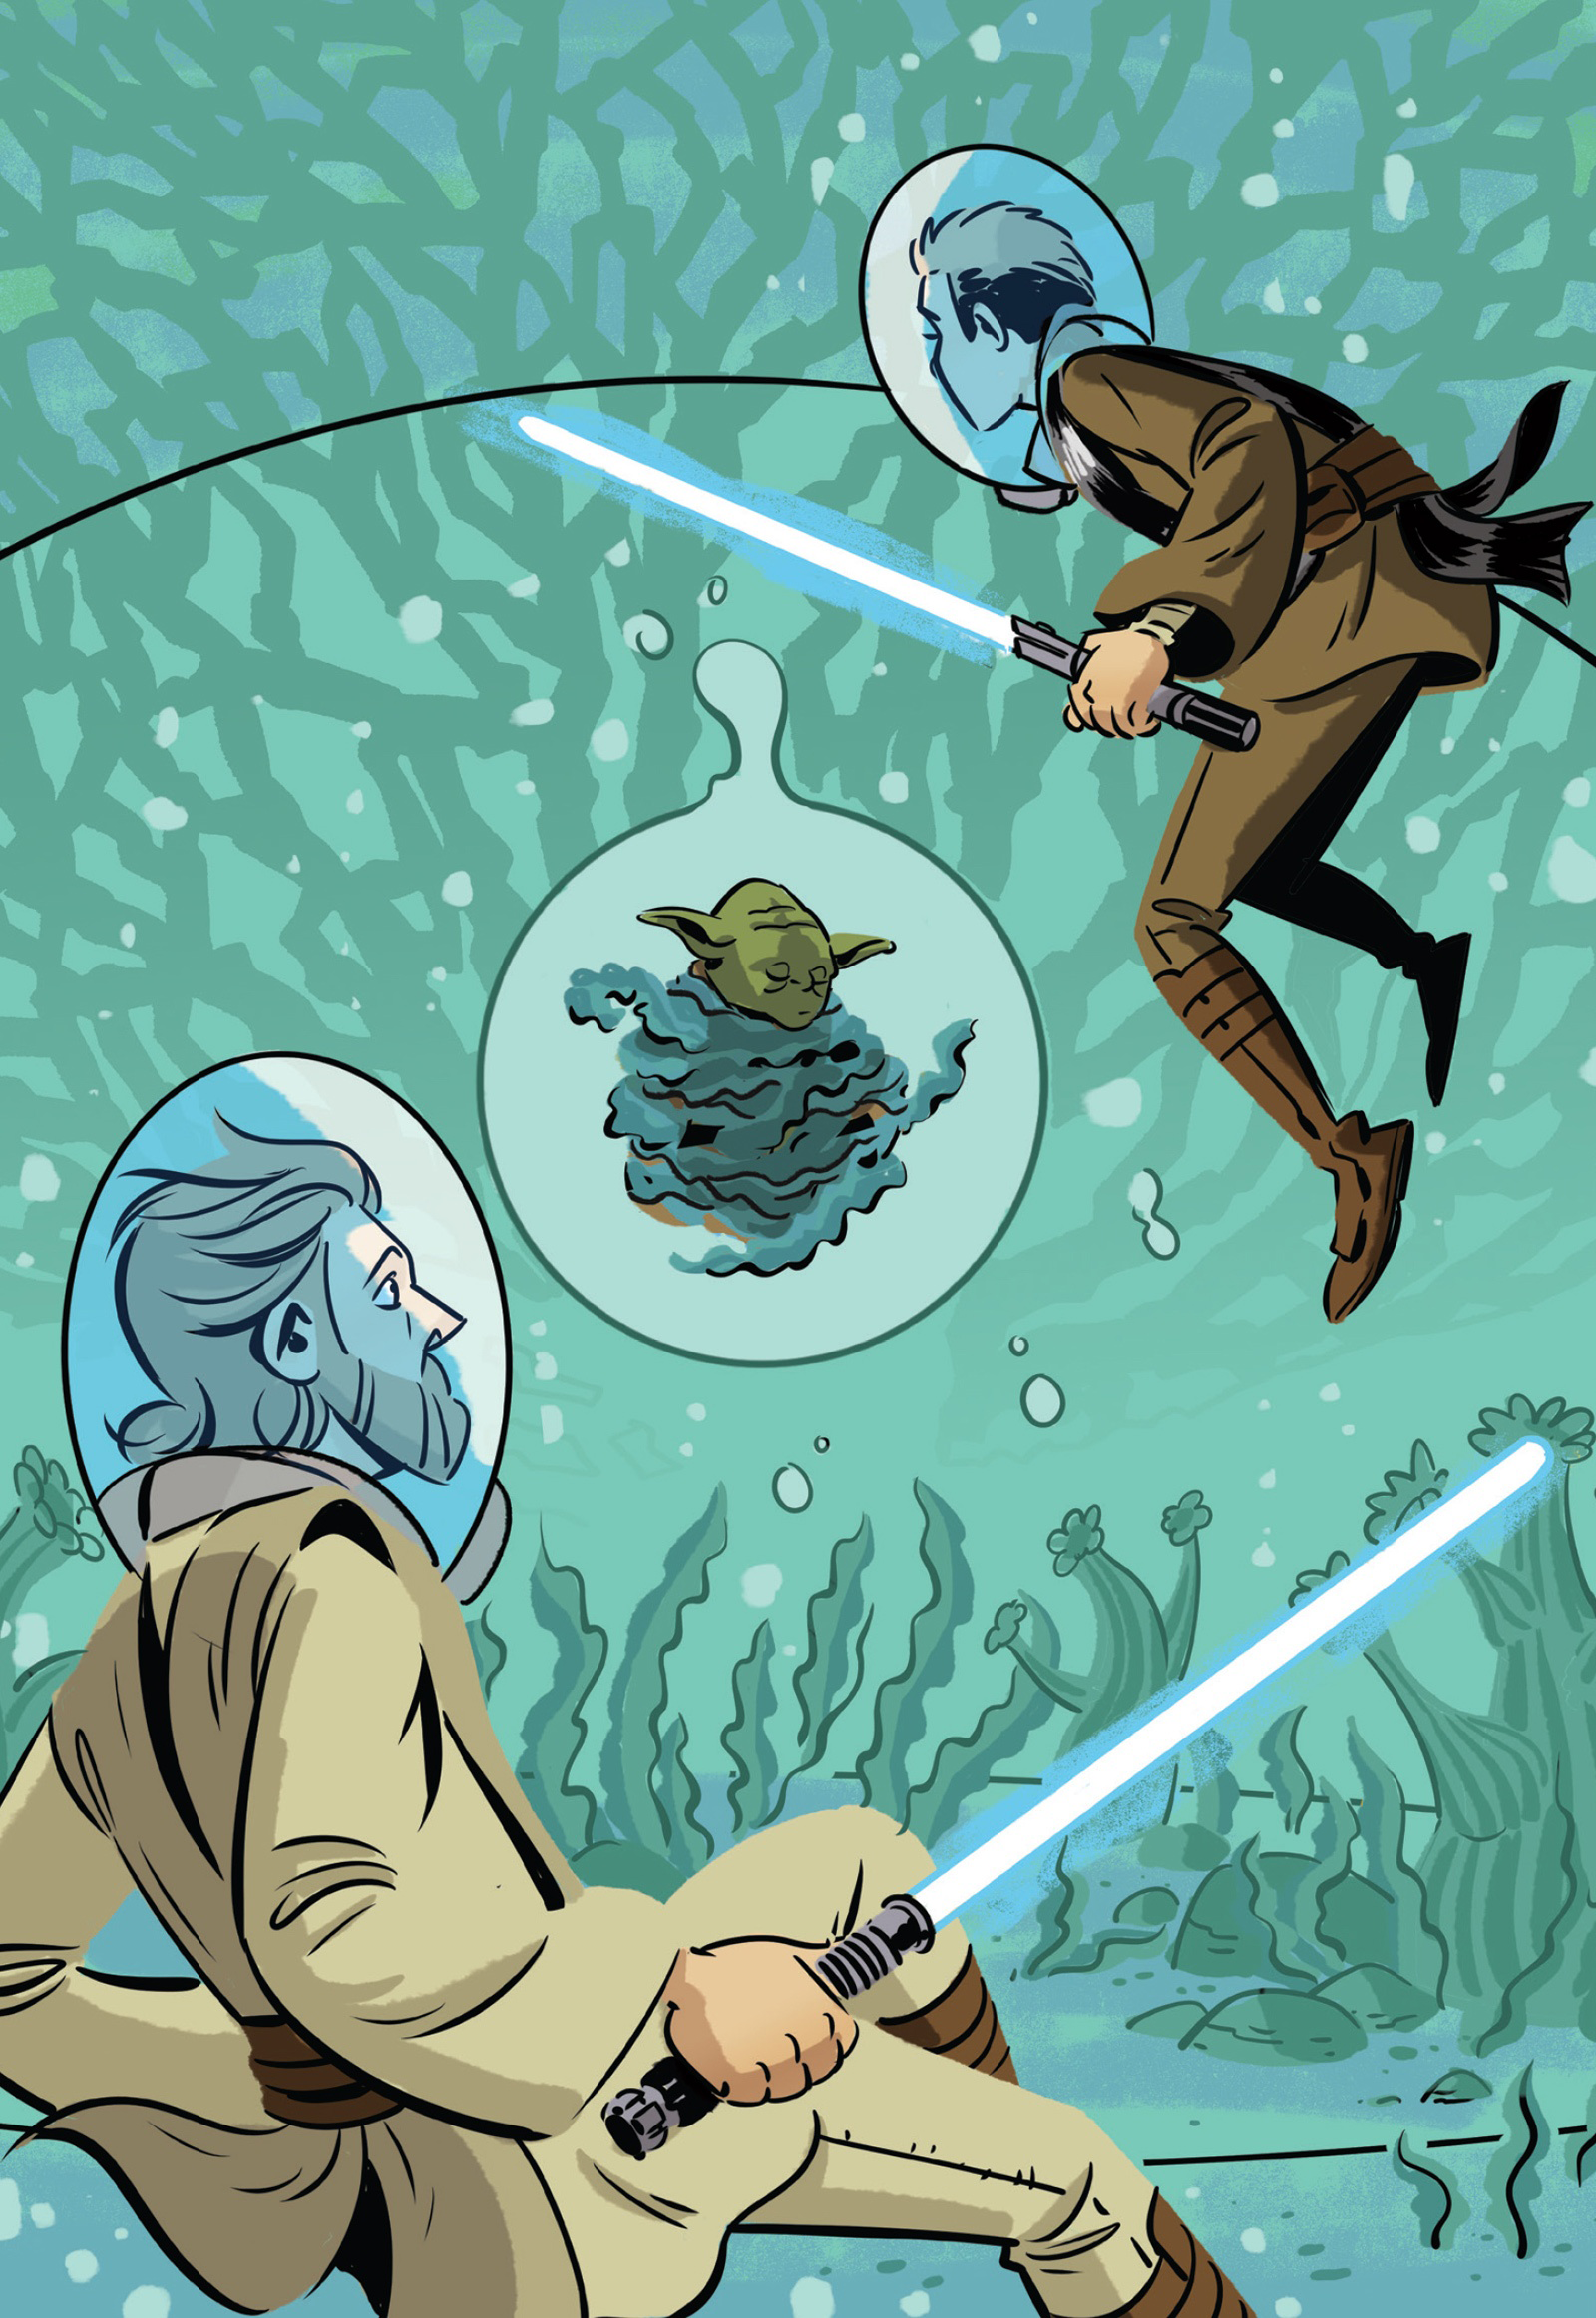 Rescue of Yoda